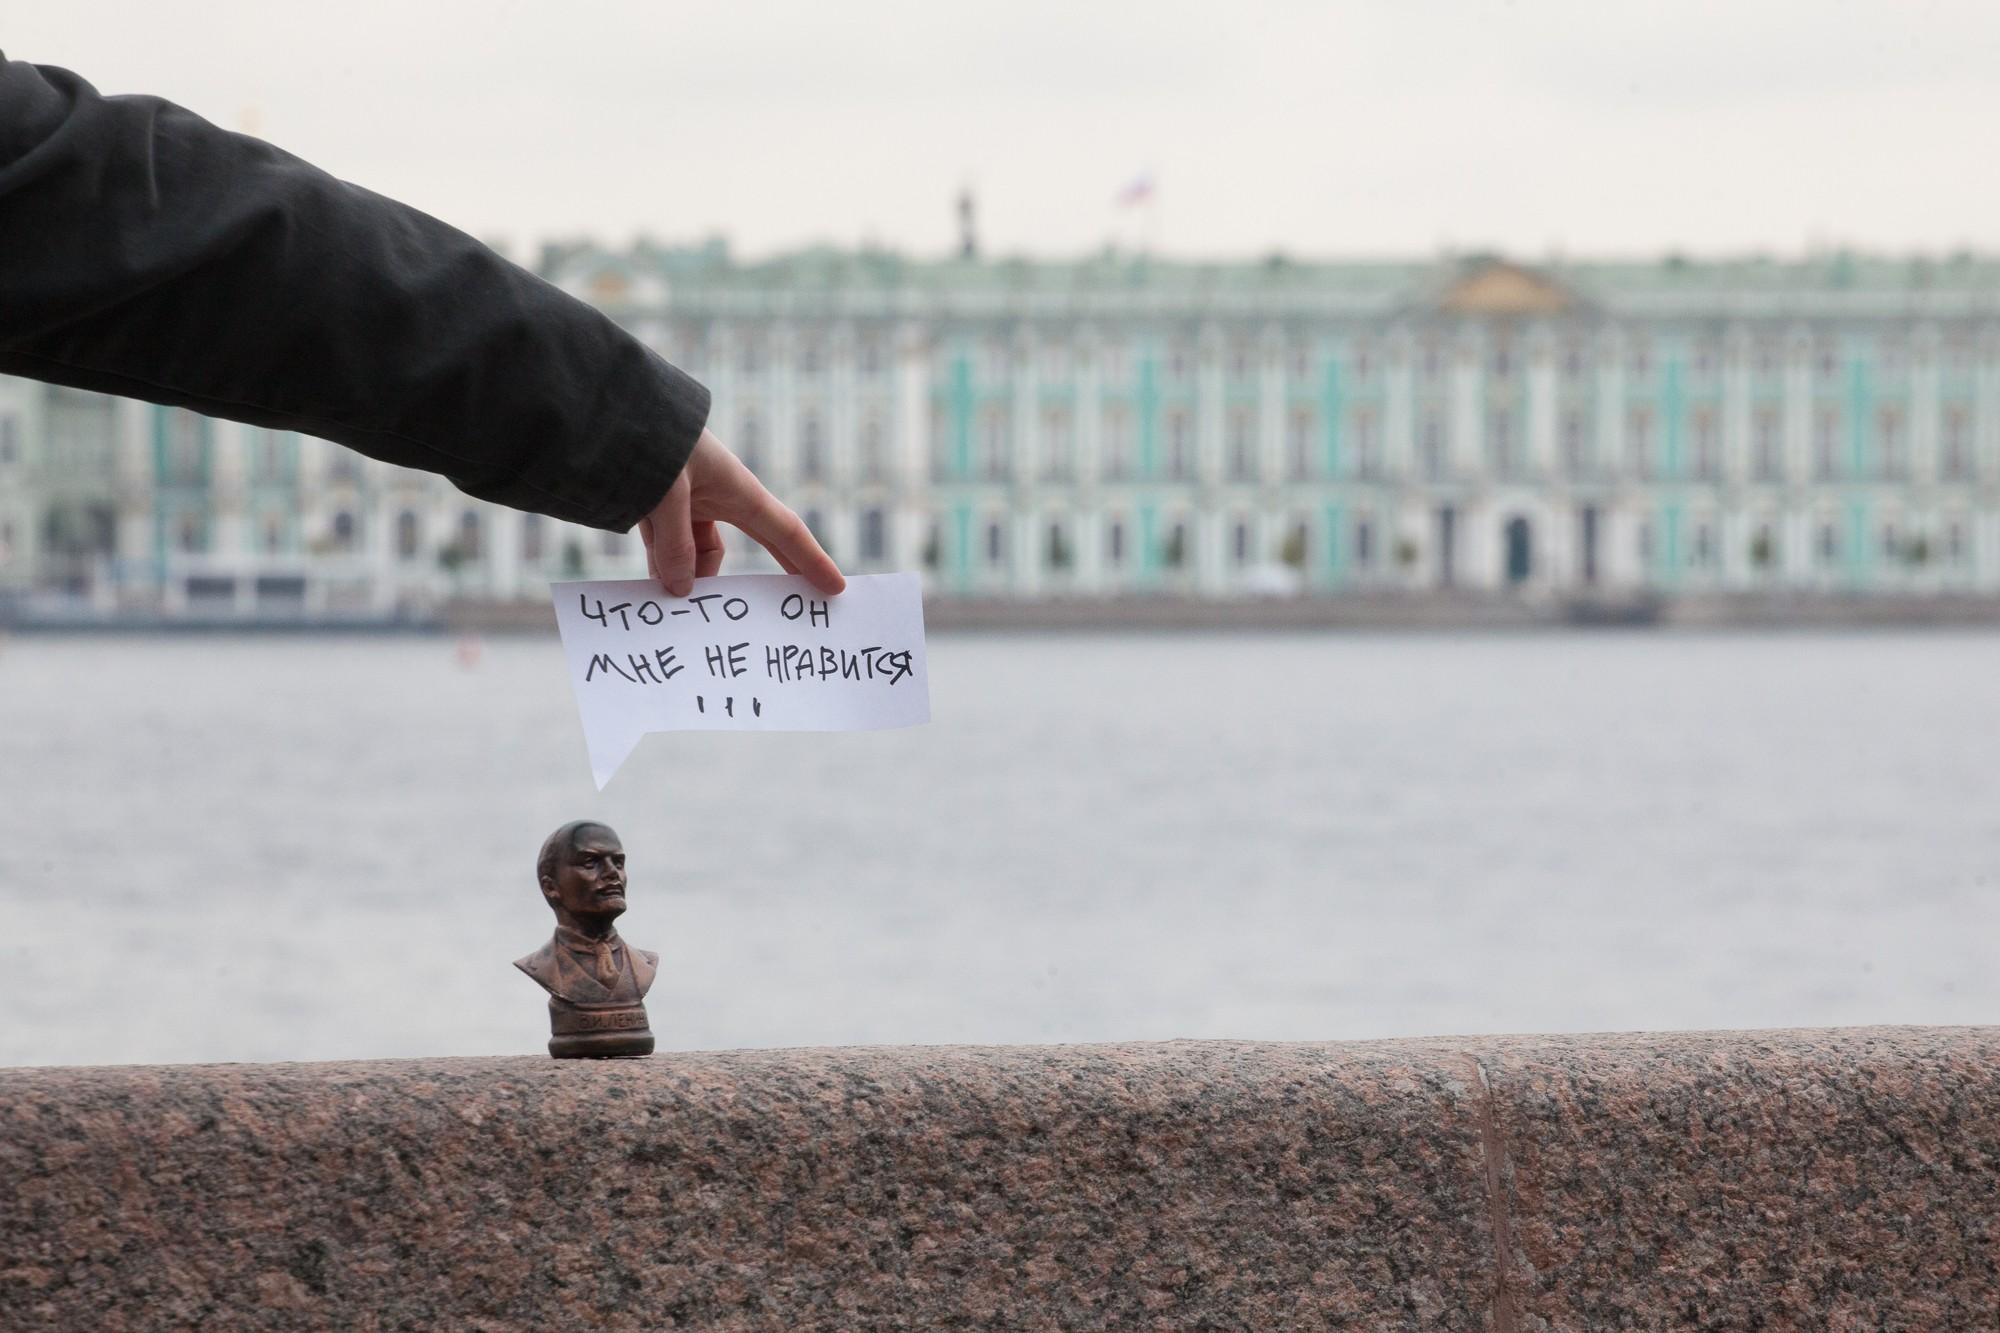 владимир ленин бюст революция зимний